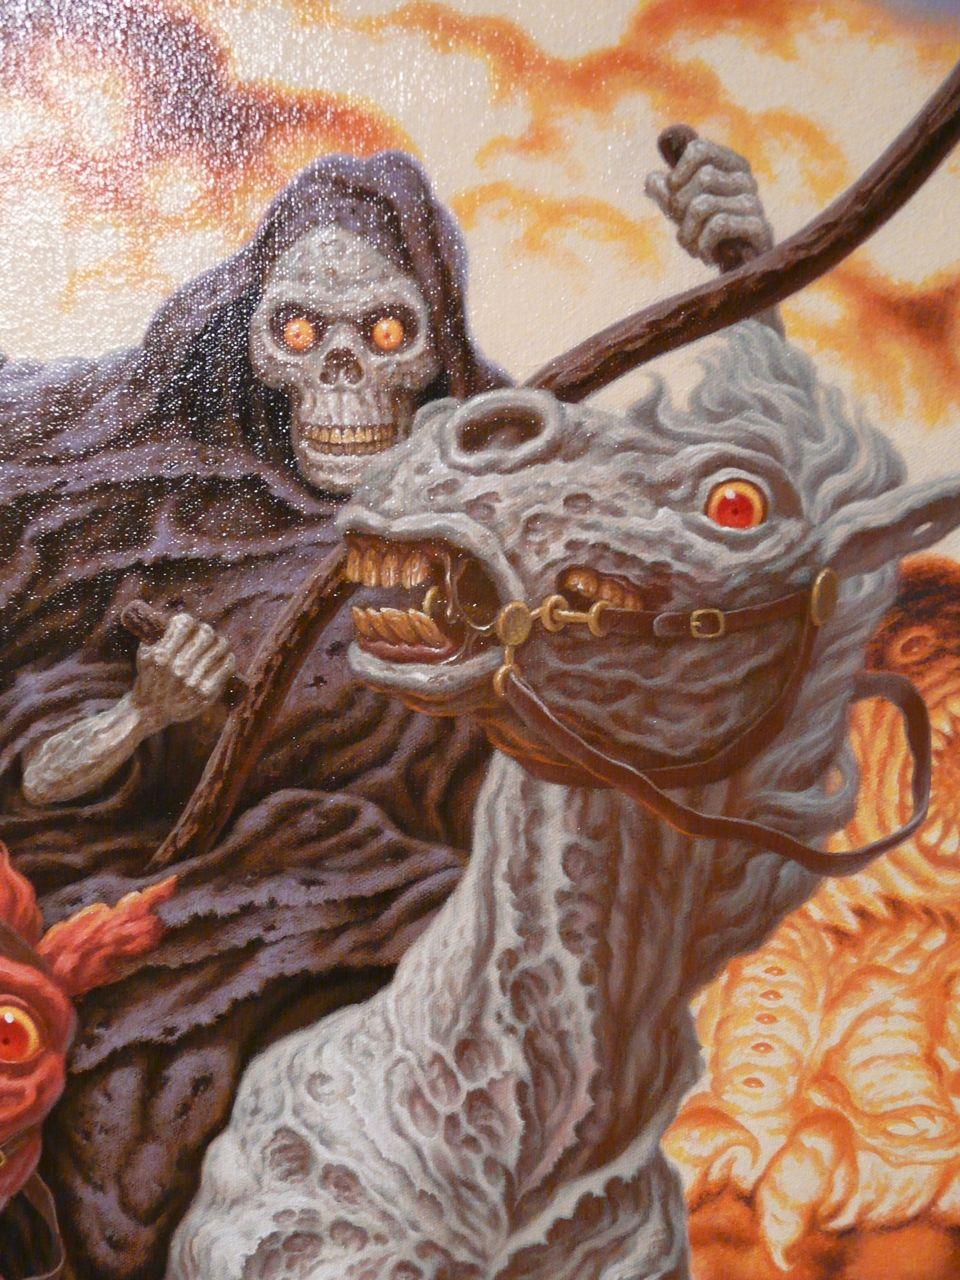 The fourth horseman - Death